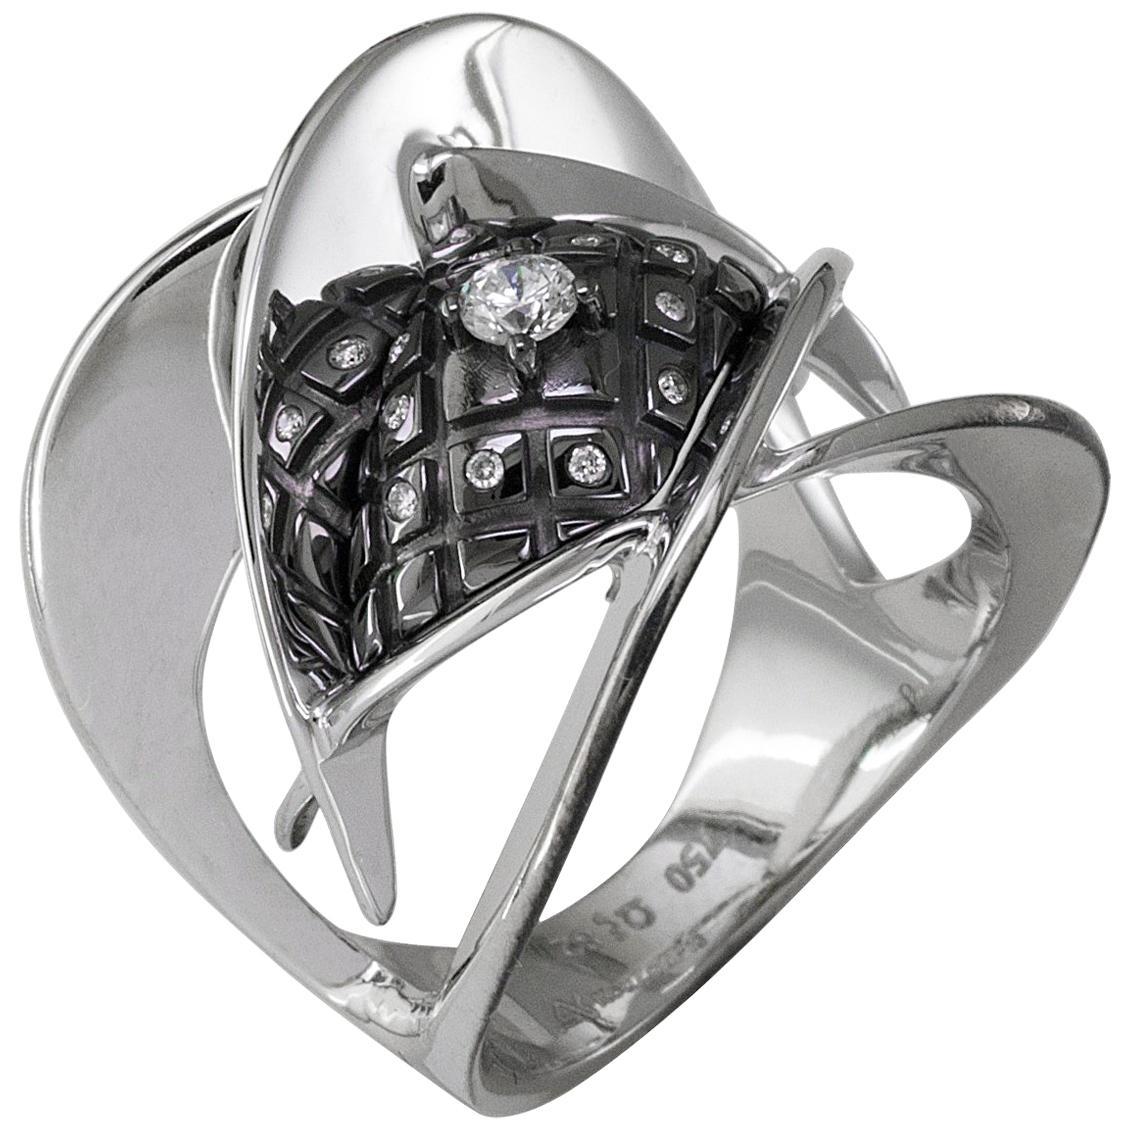 Georgios Collections 18 Karat White Gold Diamond Ring with Black Rhodium